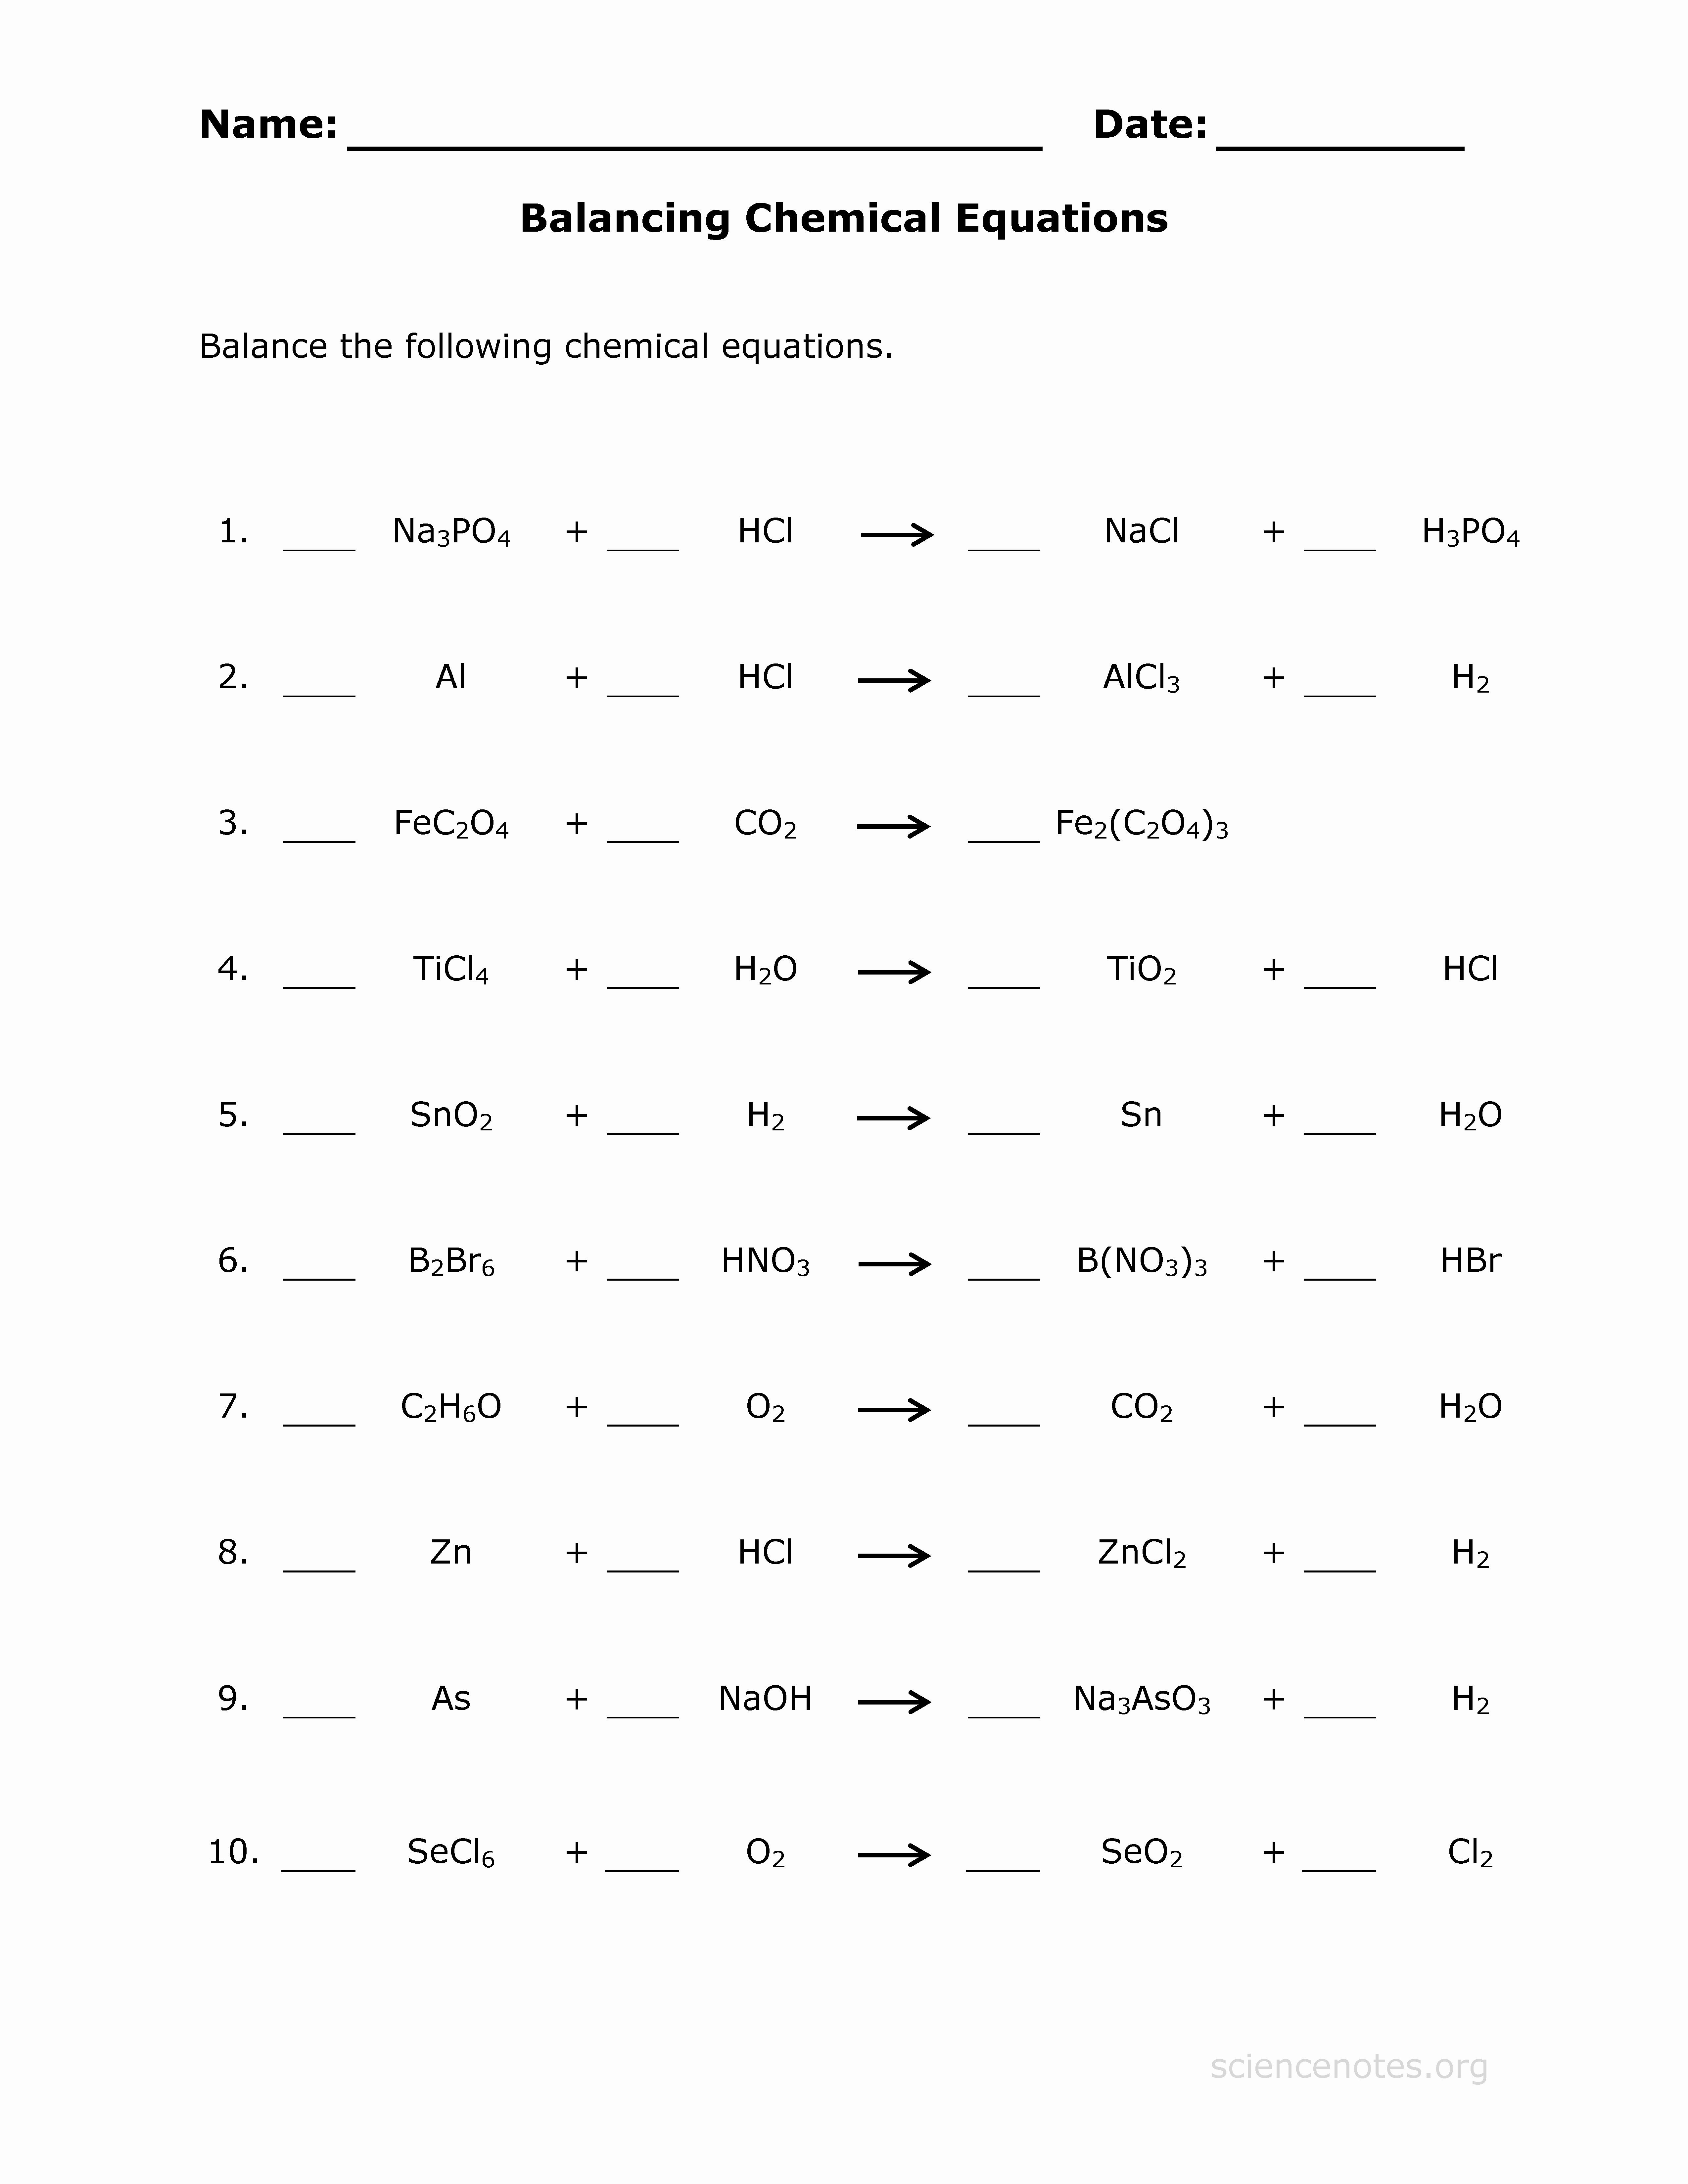 Balancing Chemical Equation Worksheet Lovely Balance Chemical Equations Practice Sheet